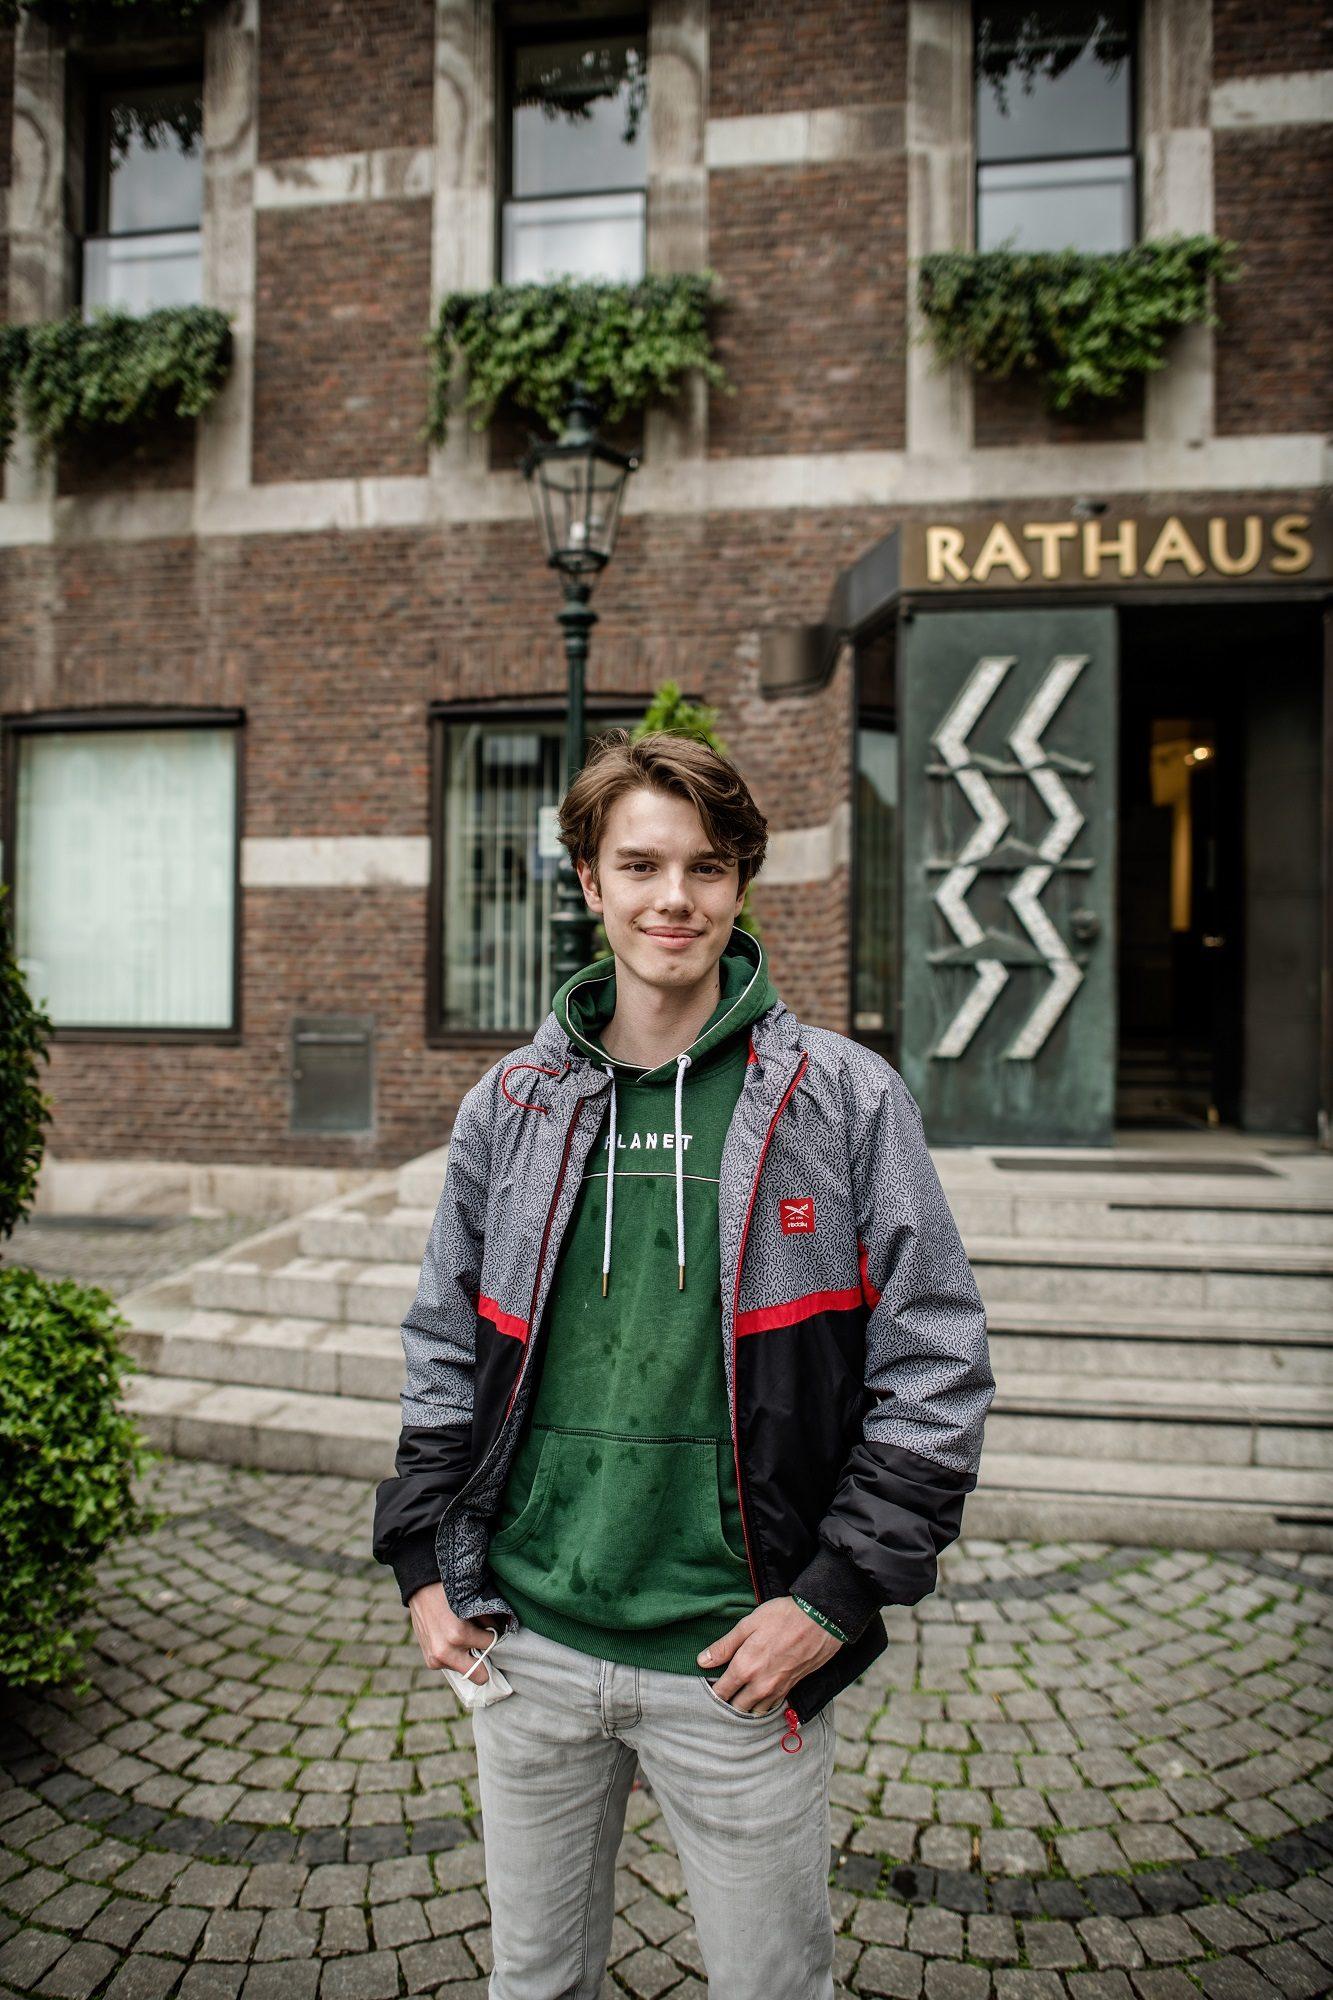 Pablo Voss vor dem Düsseldorfer Rathaus. Links hinter ihm das Fenster, in dem er gerne die CO2-Uhr sehen würde. Foto: Andreas Endermann